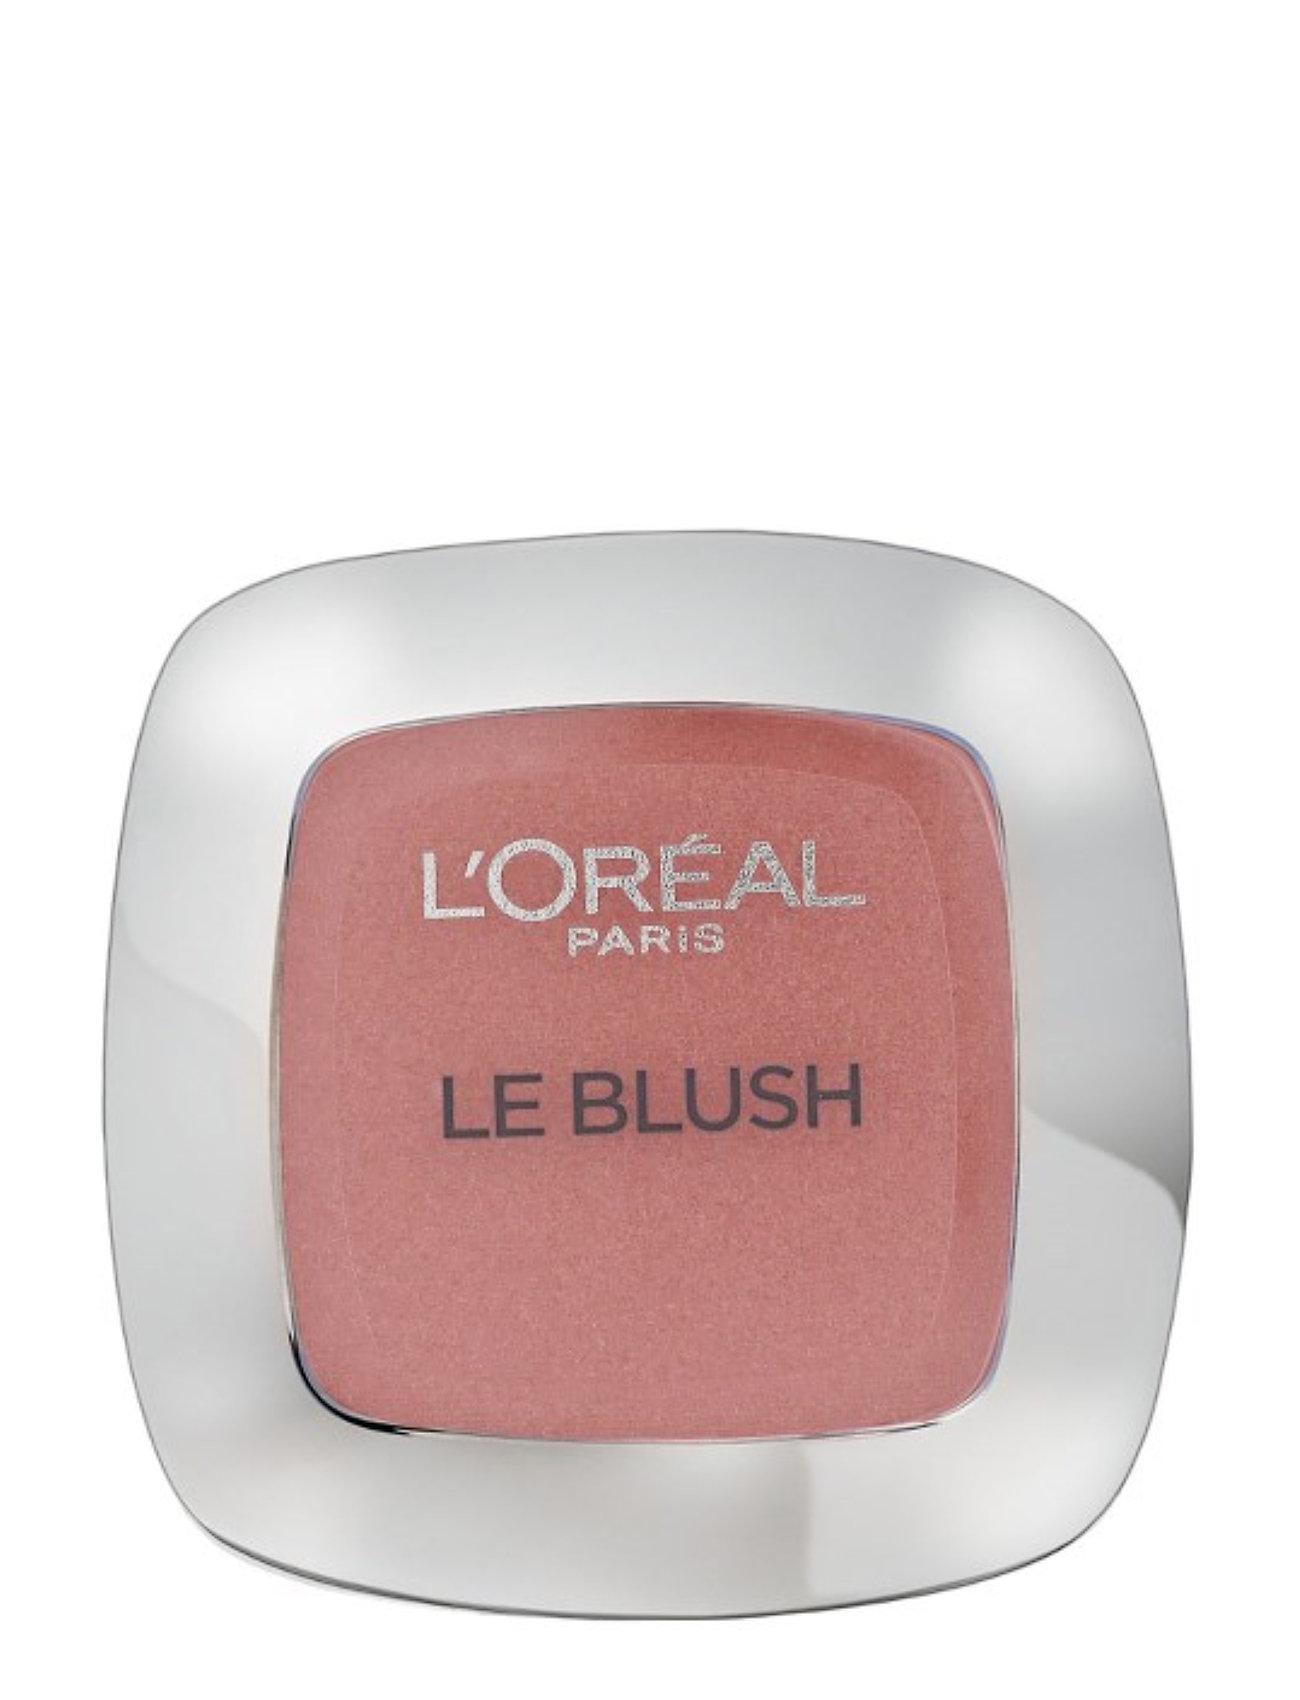 True match blush fra l'orã©al paris på boozt.com dk